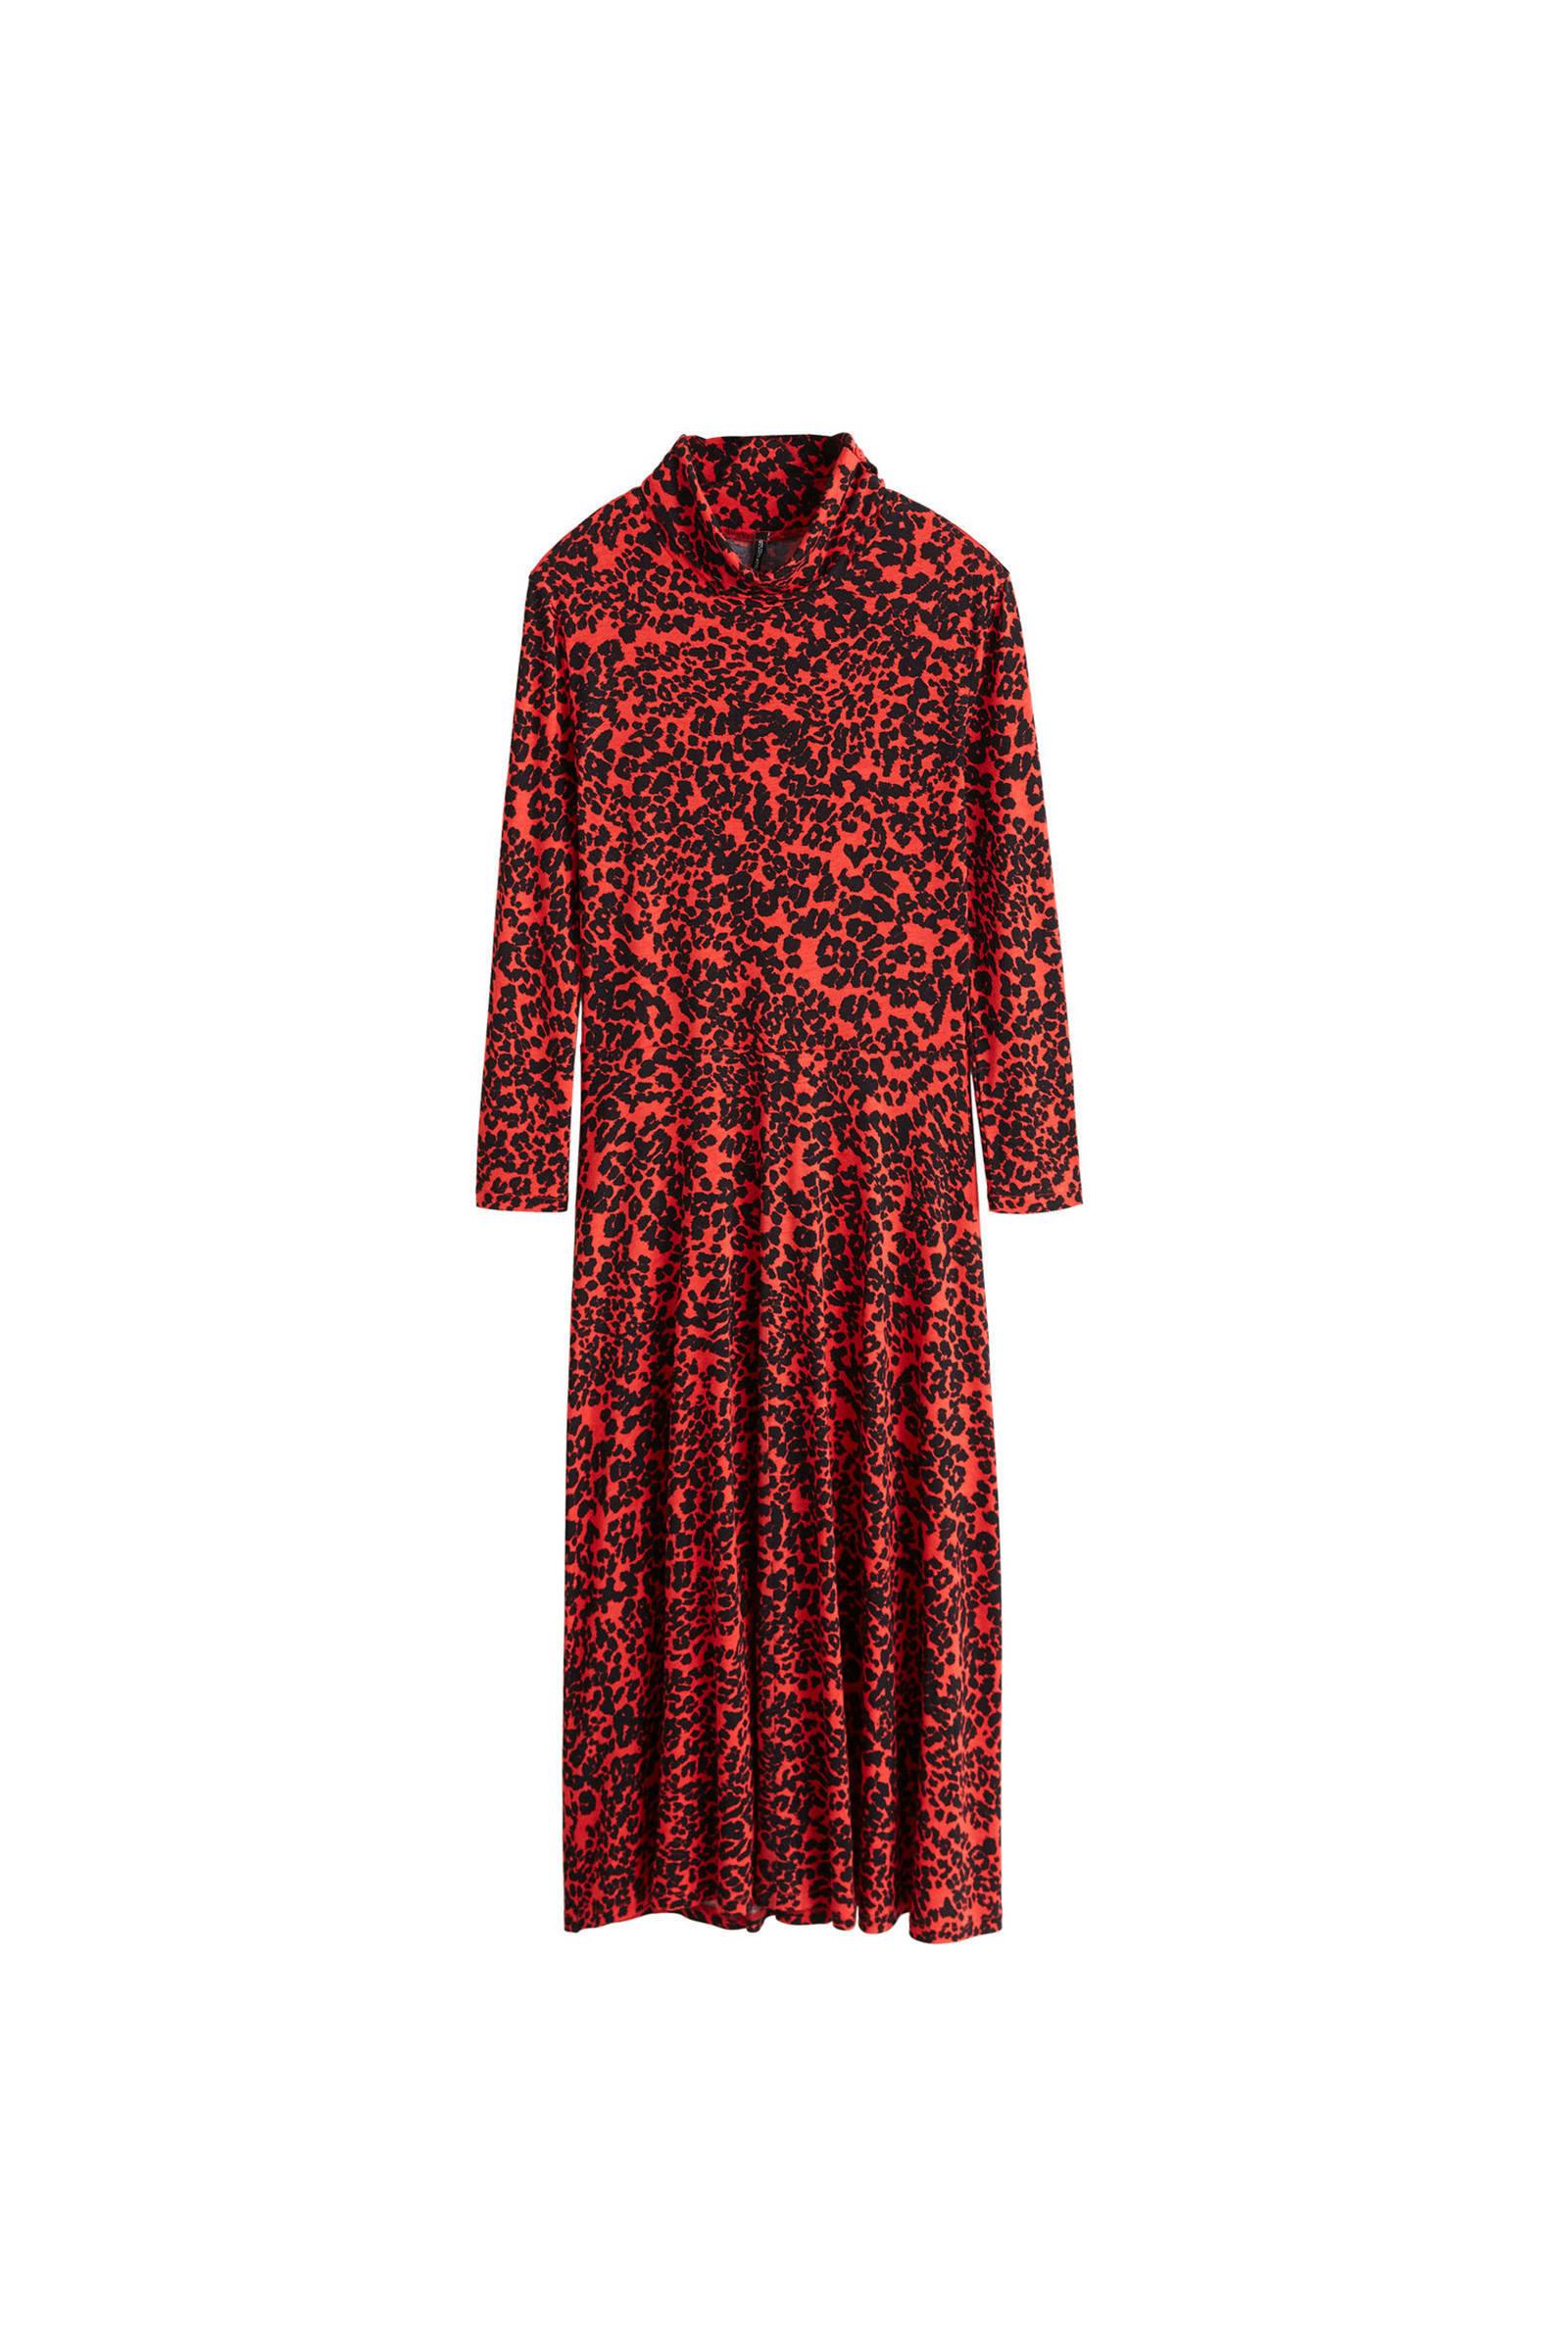 jurken onder de 20 euro